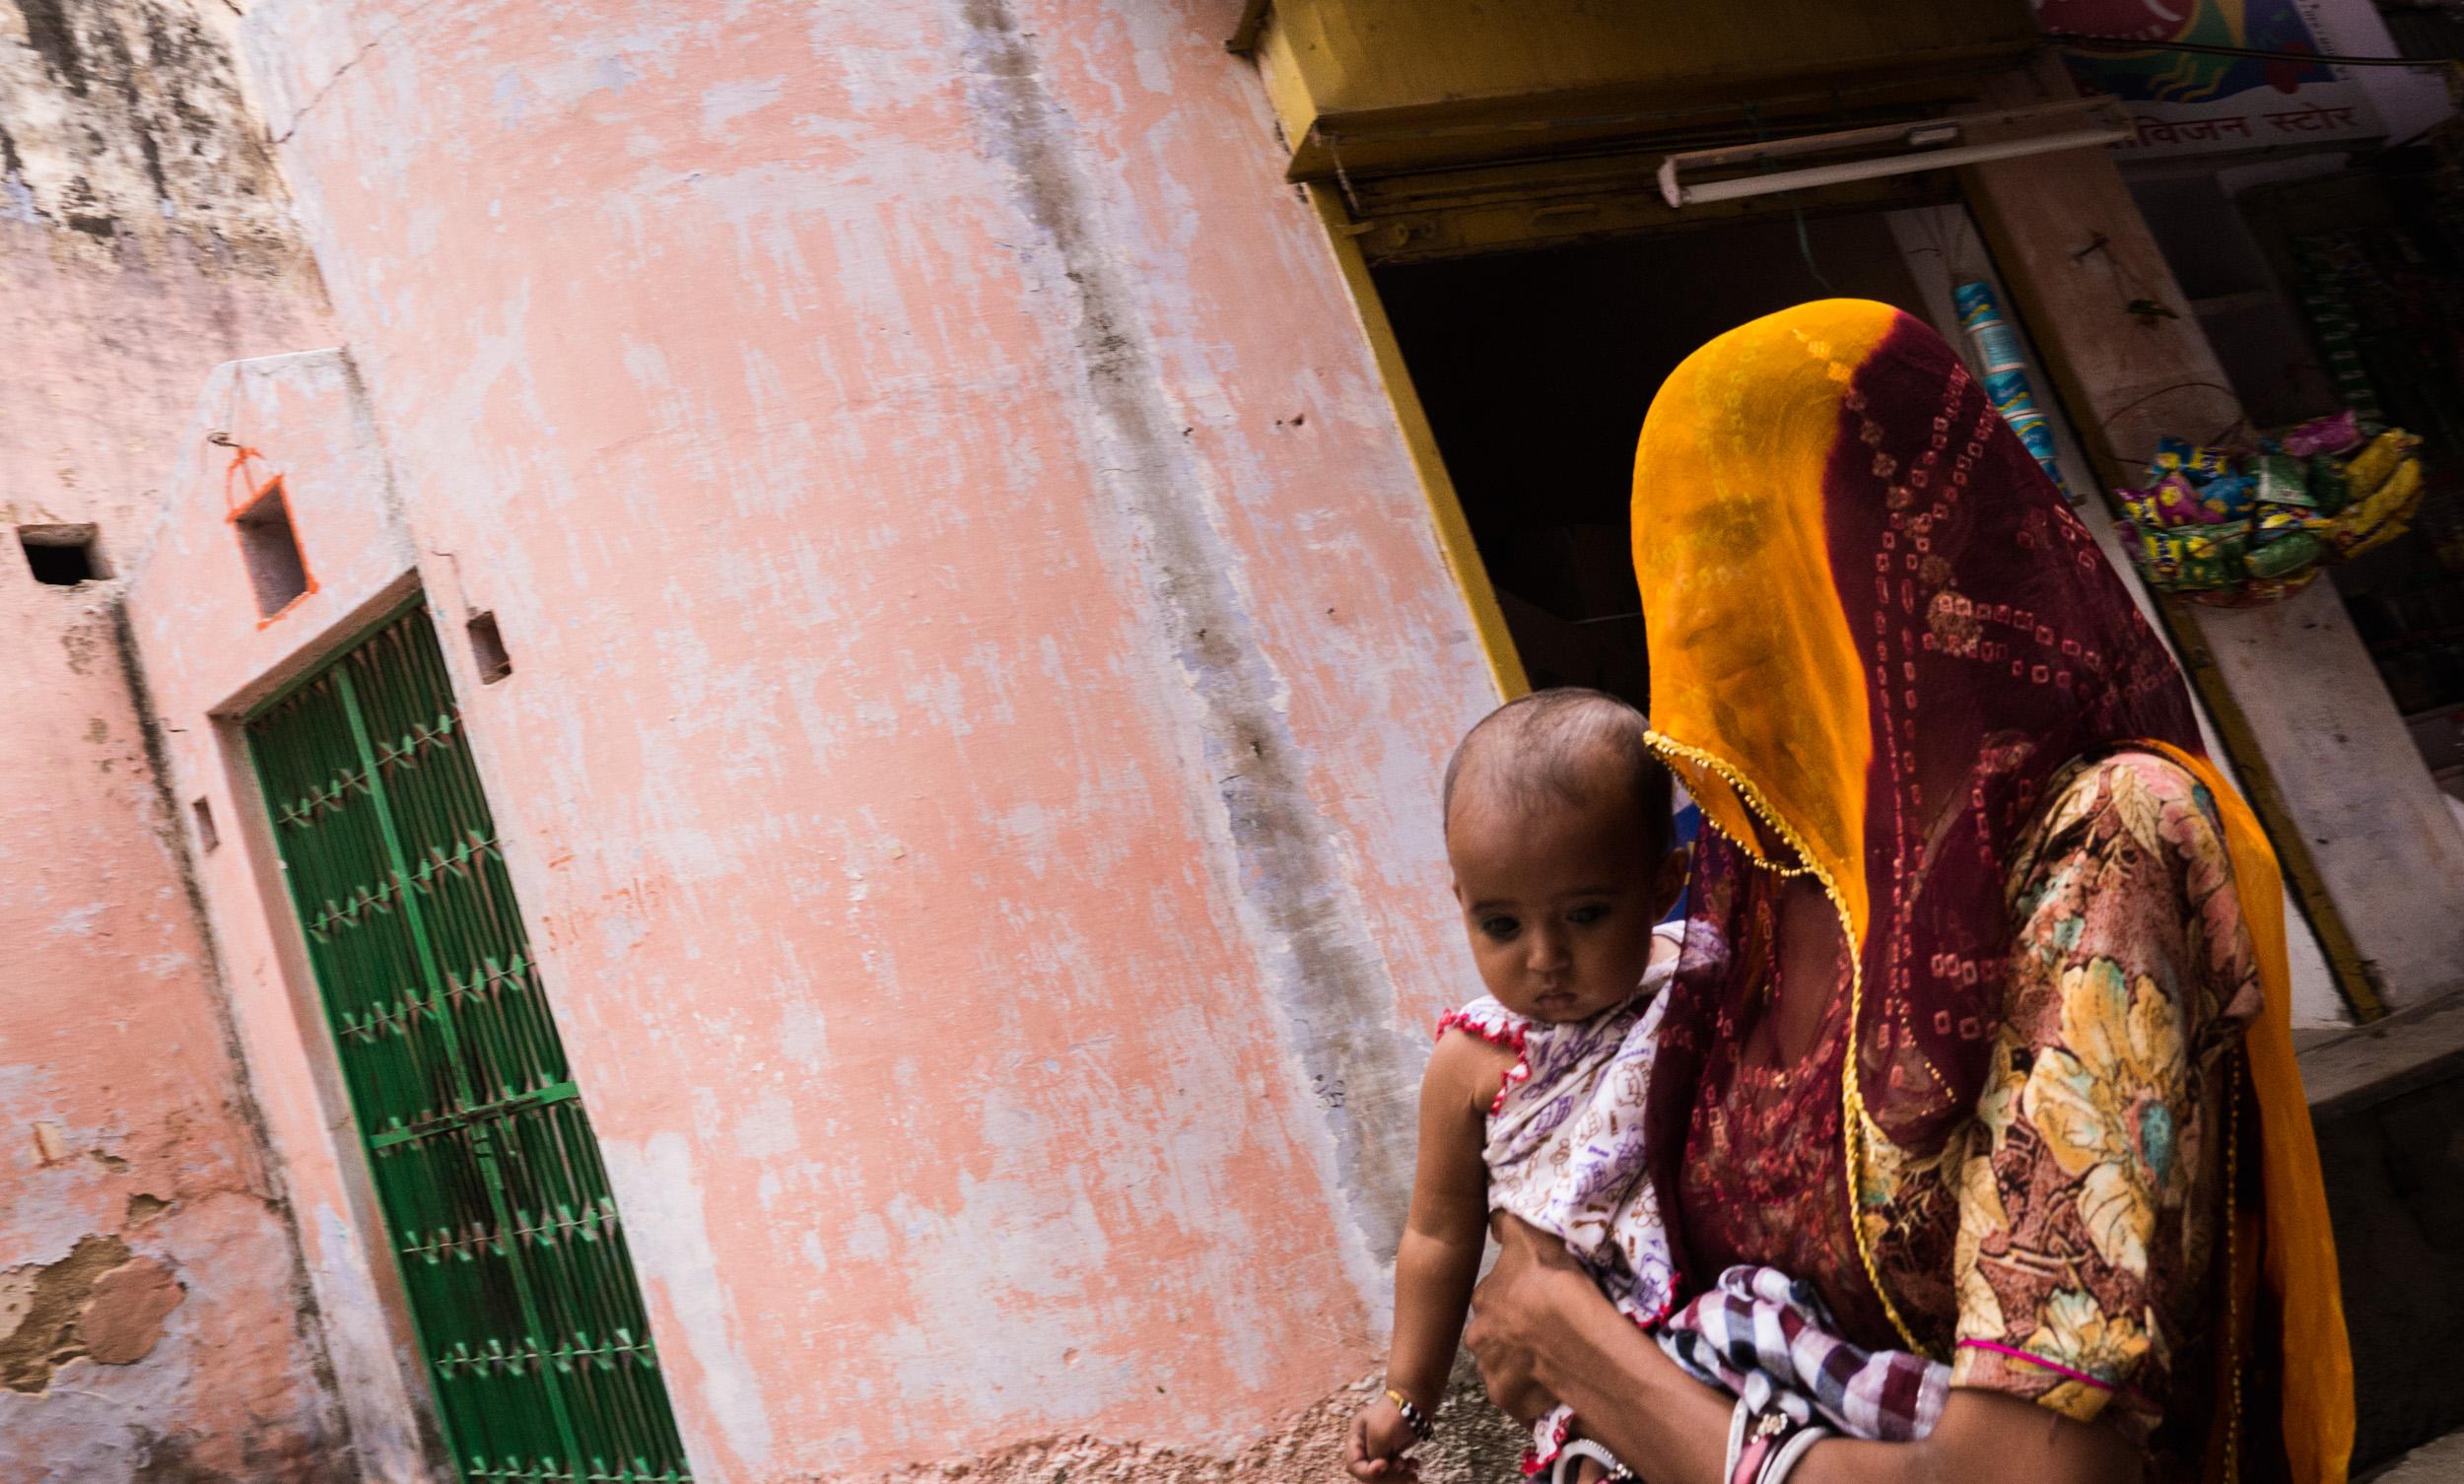 _21 Woman in Redyellow Sari with Child Pushkar.jpg